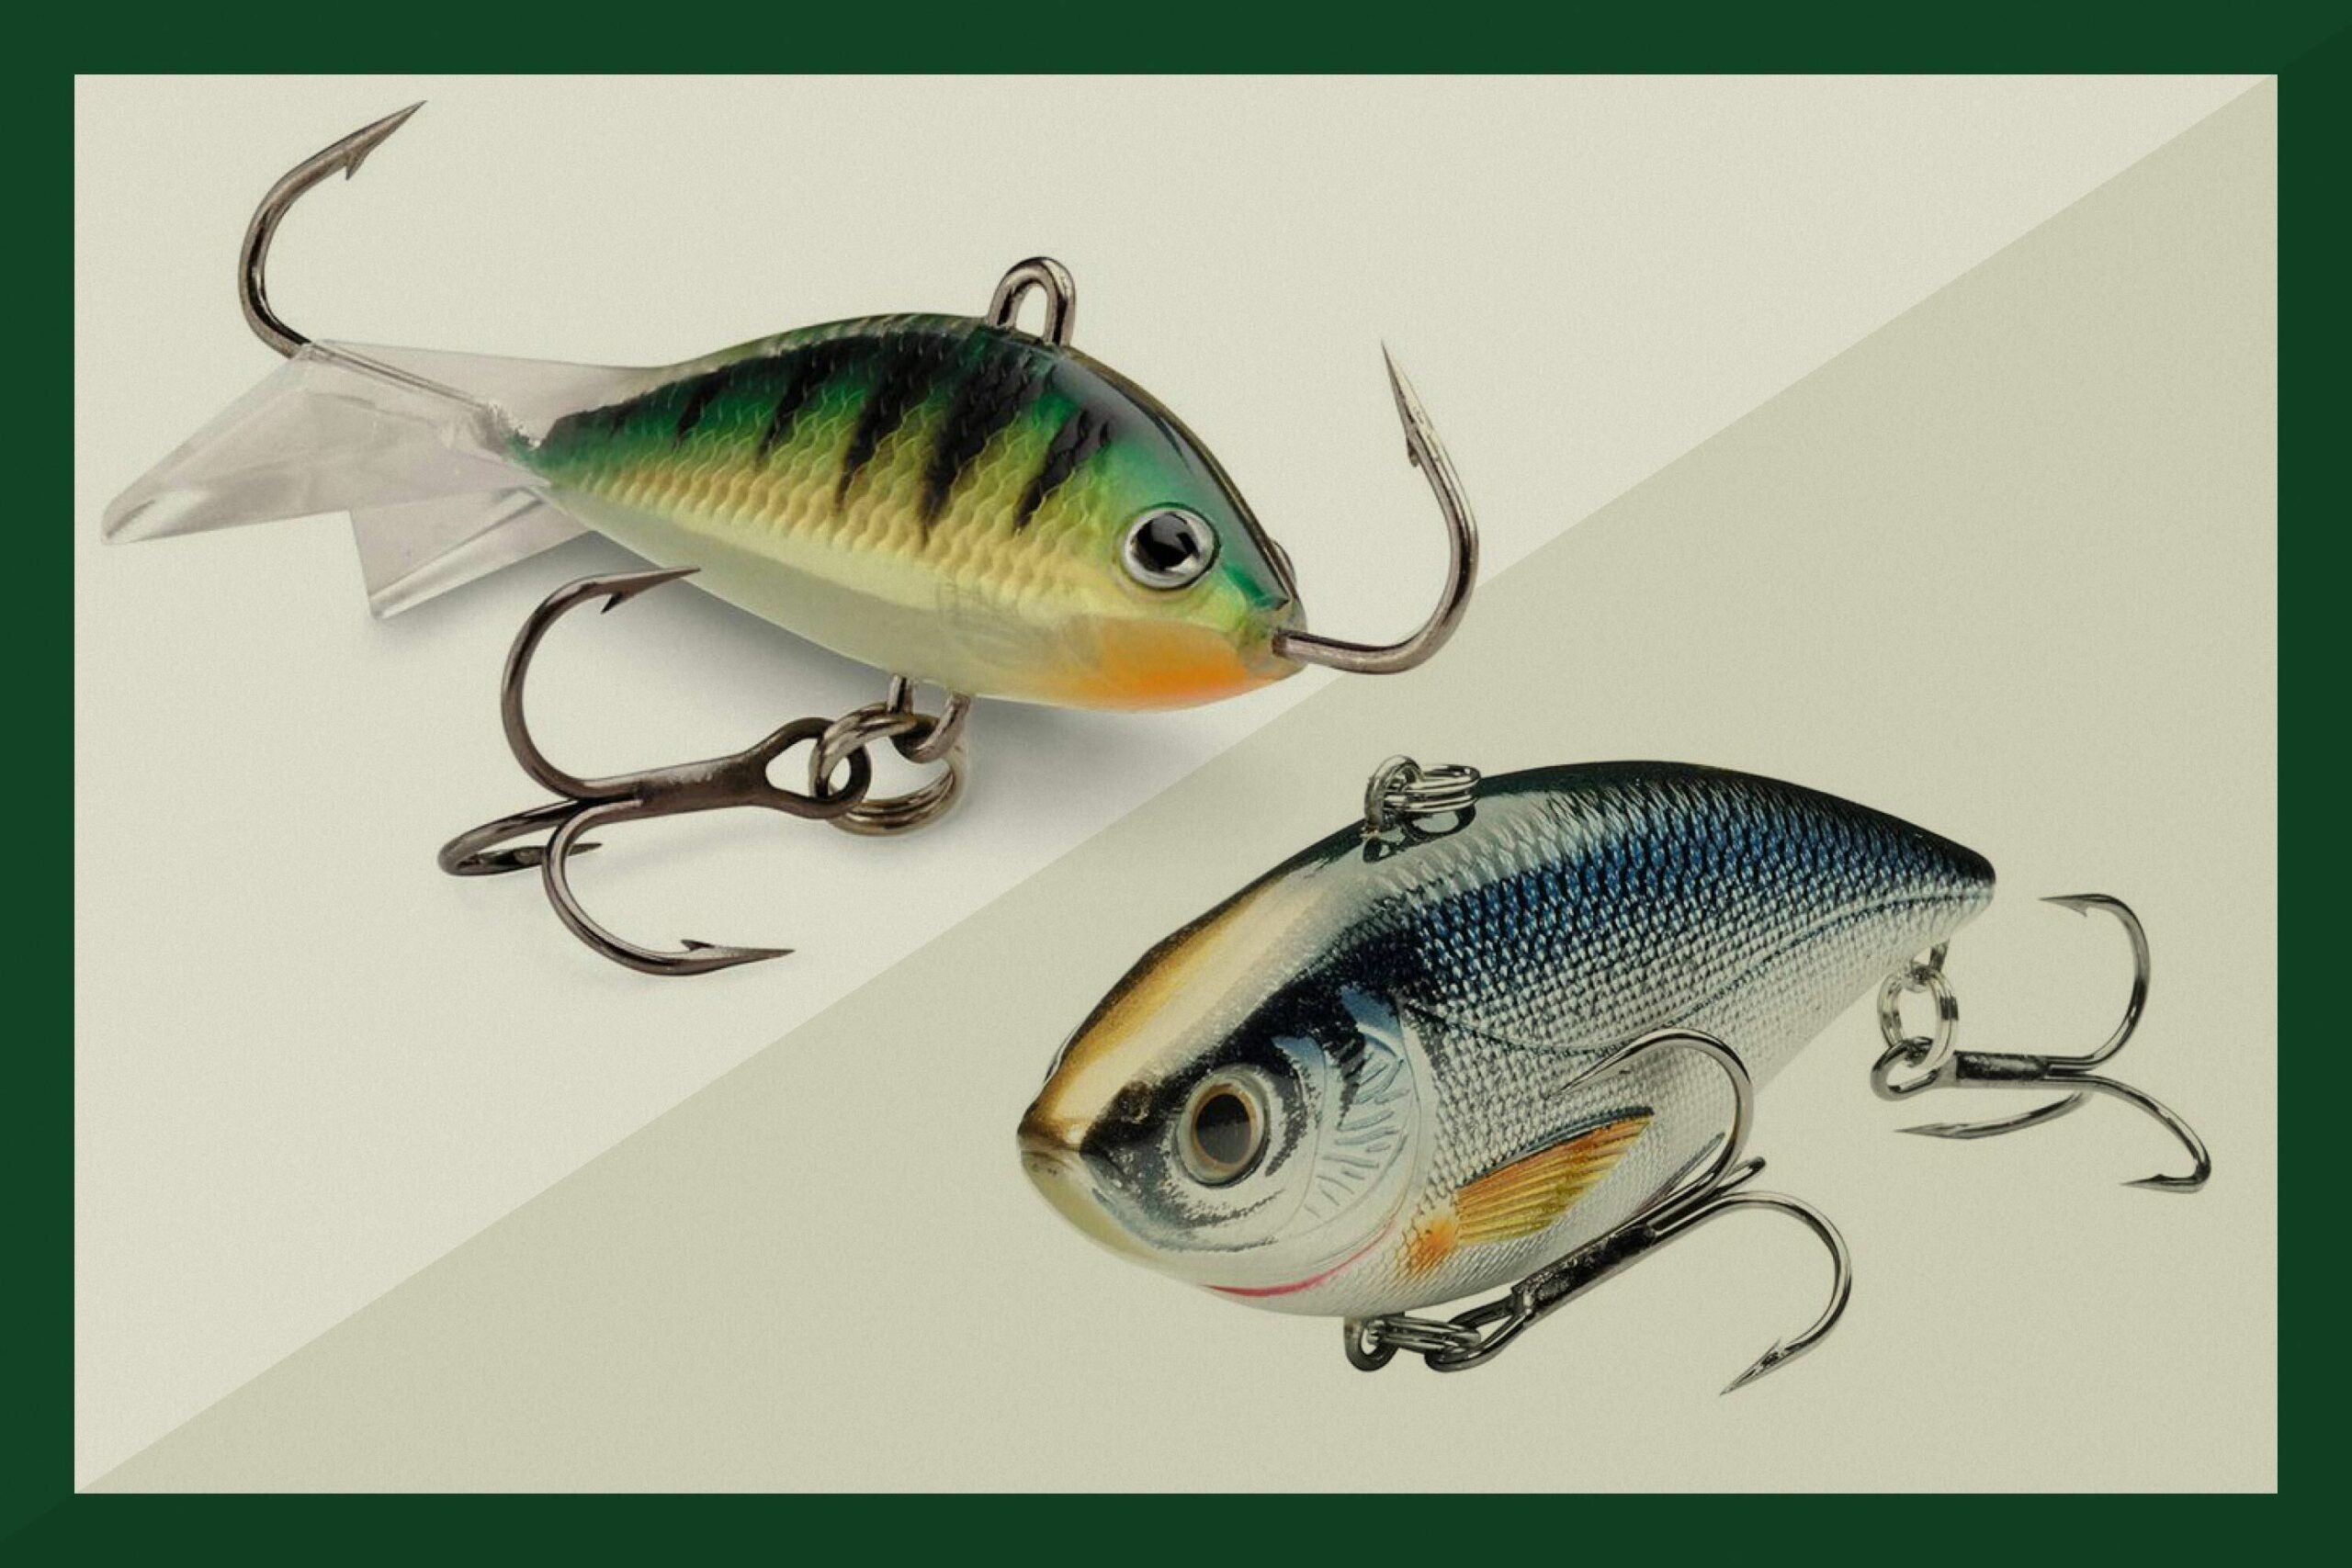 3 pcs Fish Attractants Ball Shape Fishing Lure Baits for Elders